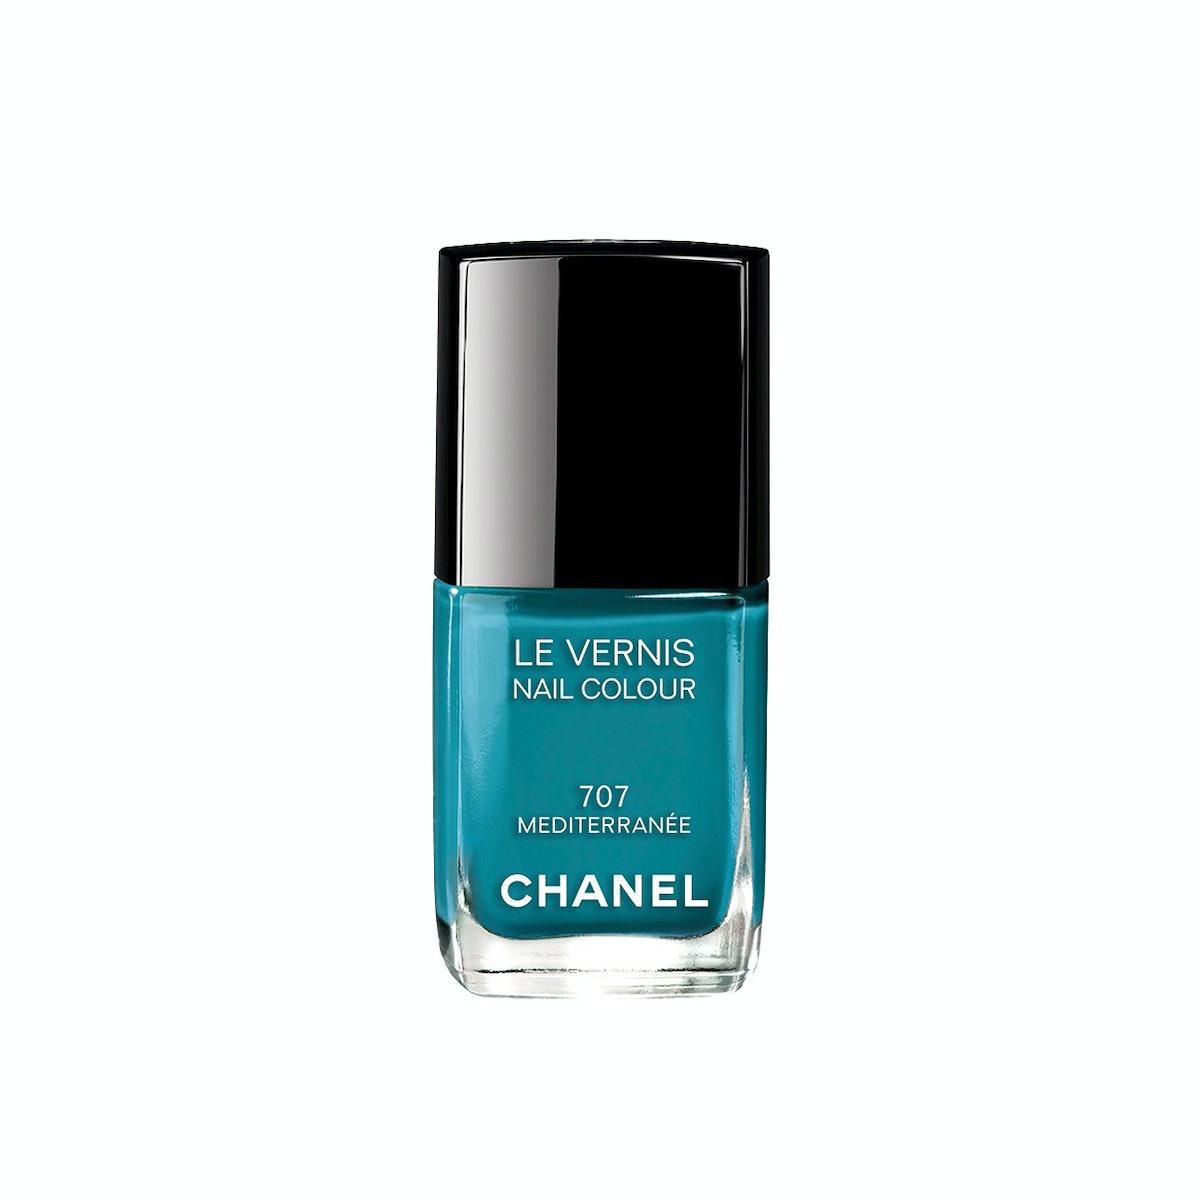 Chanel's Mediterranee